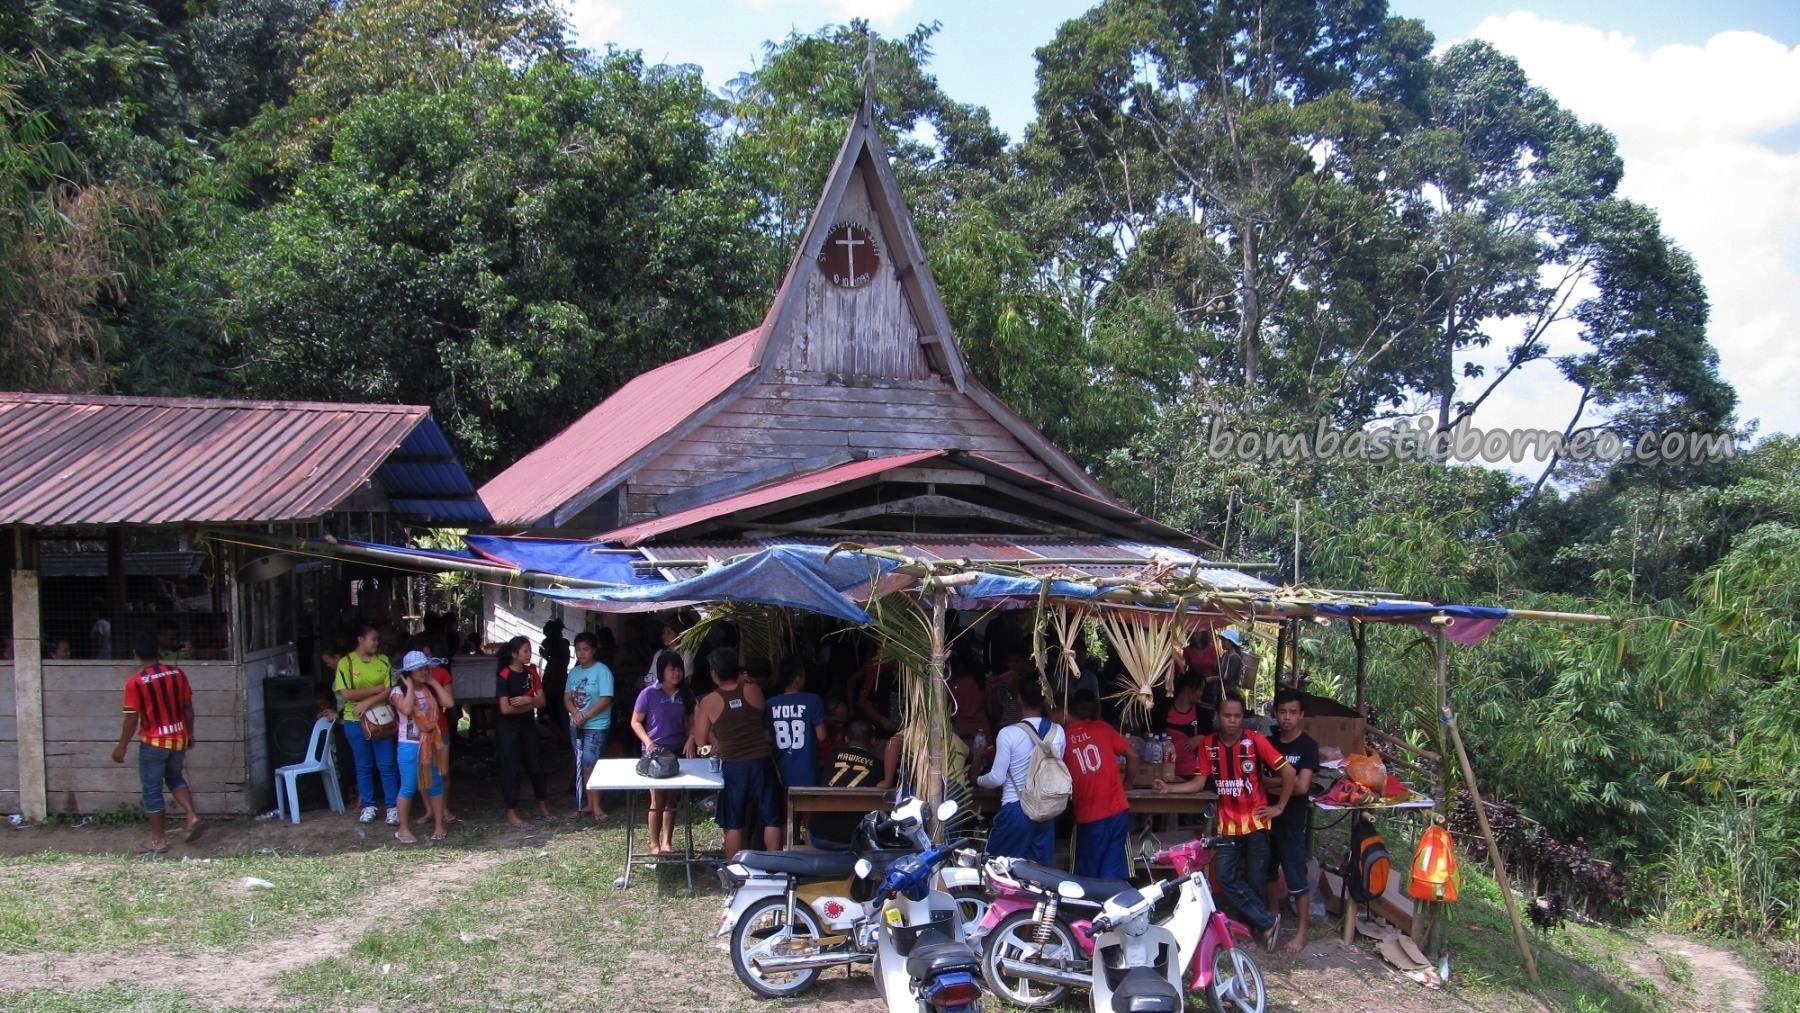 Bidayuh, Borneo, Christian, dayak, Ethnic, Dusun Gun Tembawang, homestay, indigenous, Kuching, malaysia, outdoors, events, Padawan, Kiding, football match, Semban, soccer,